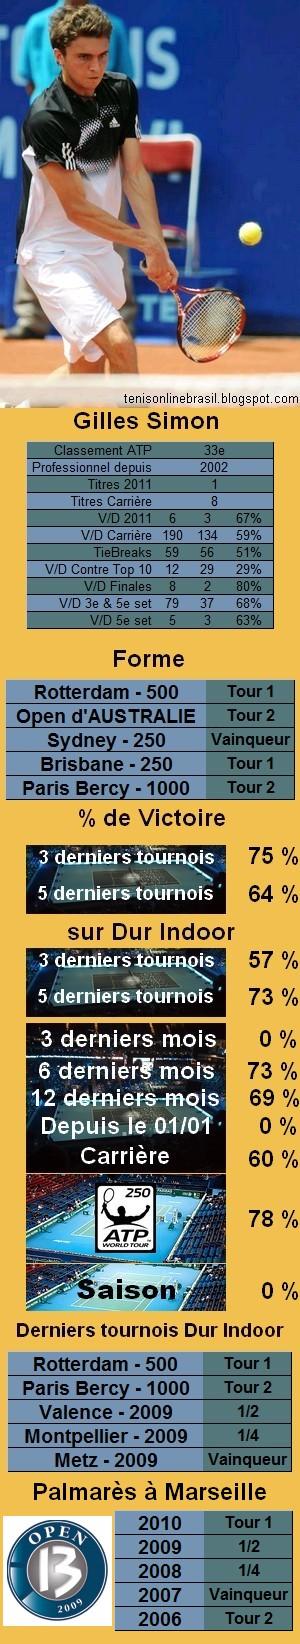 Statistiques tennis Gilles Simon